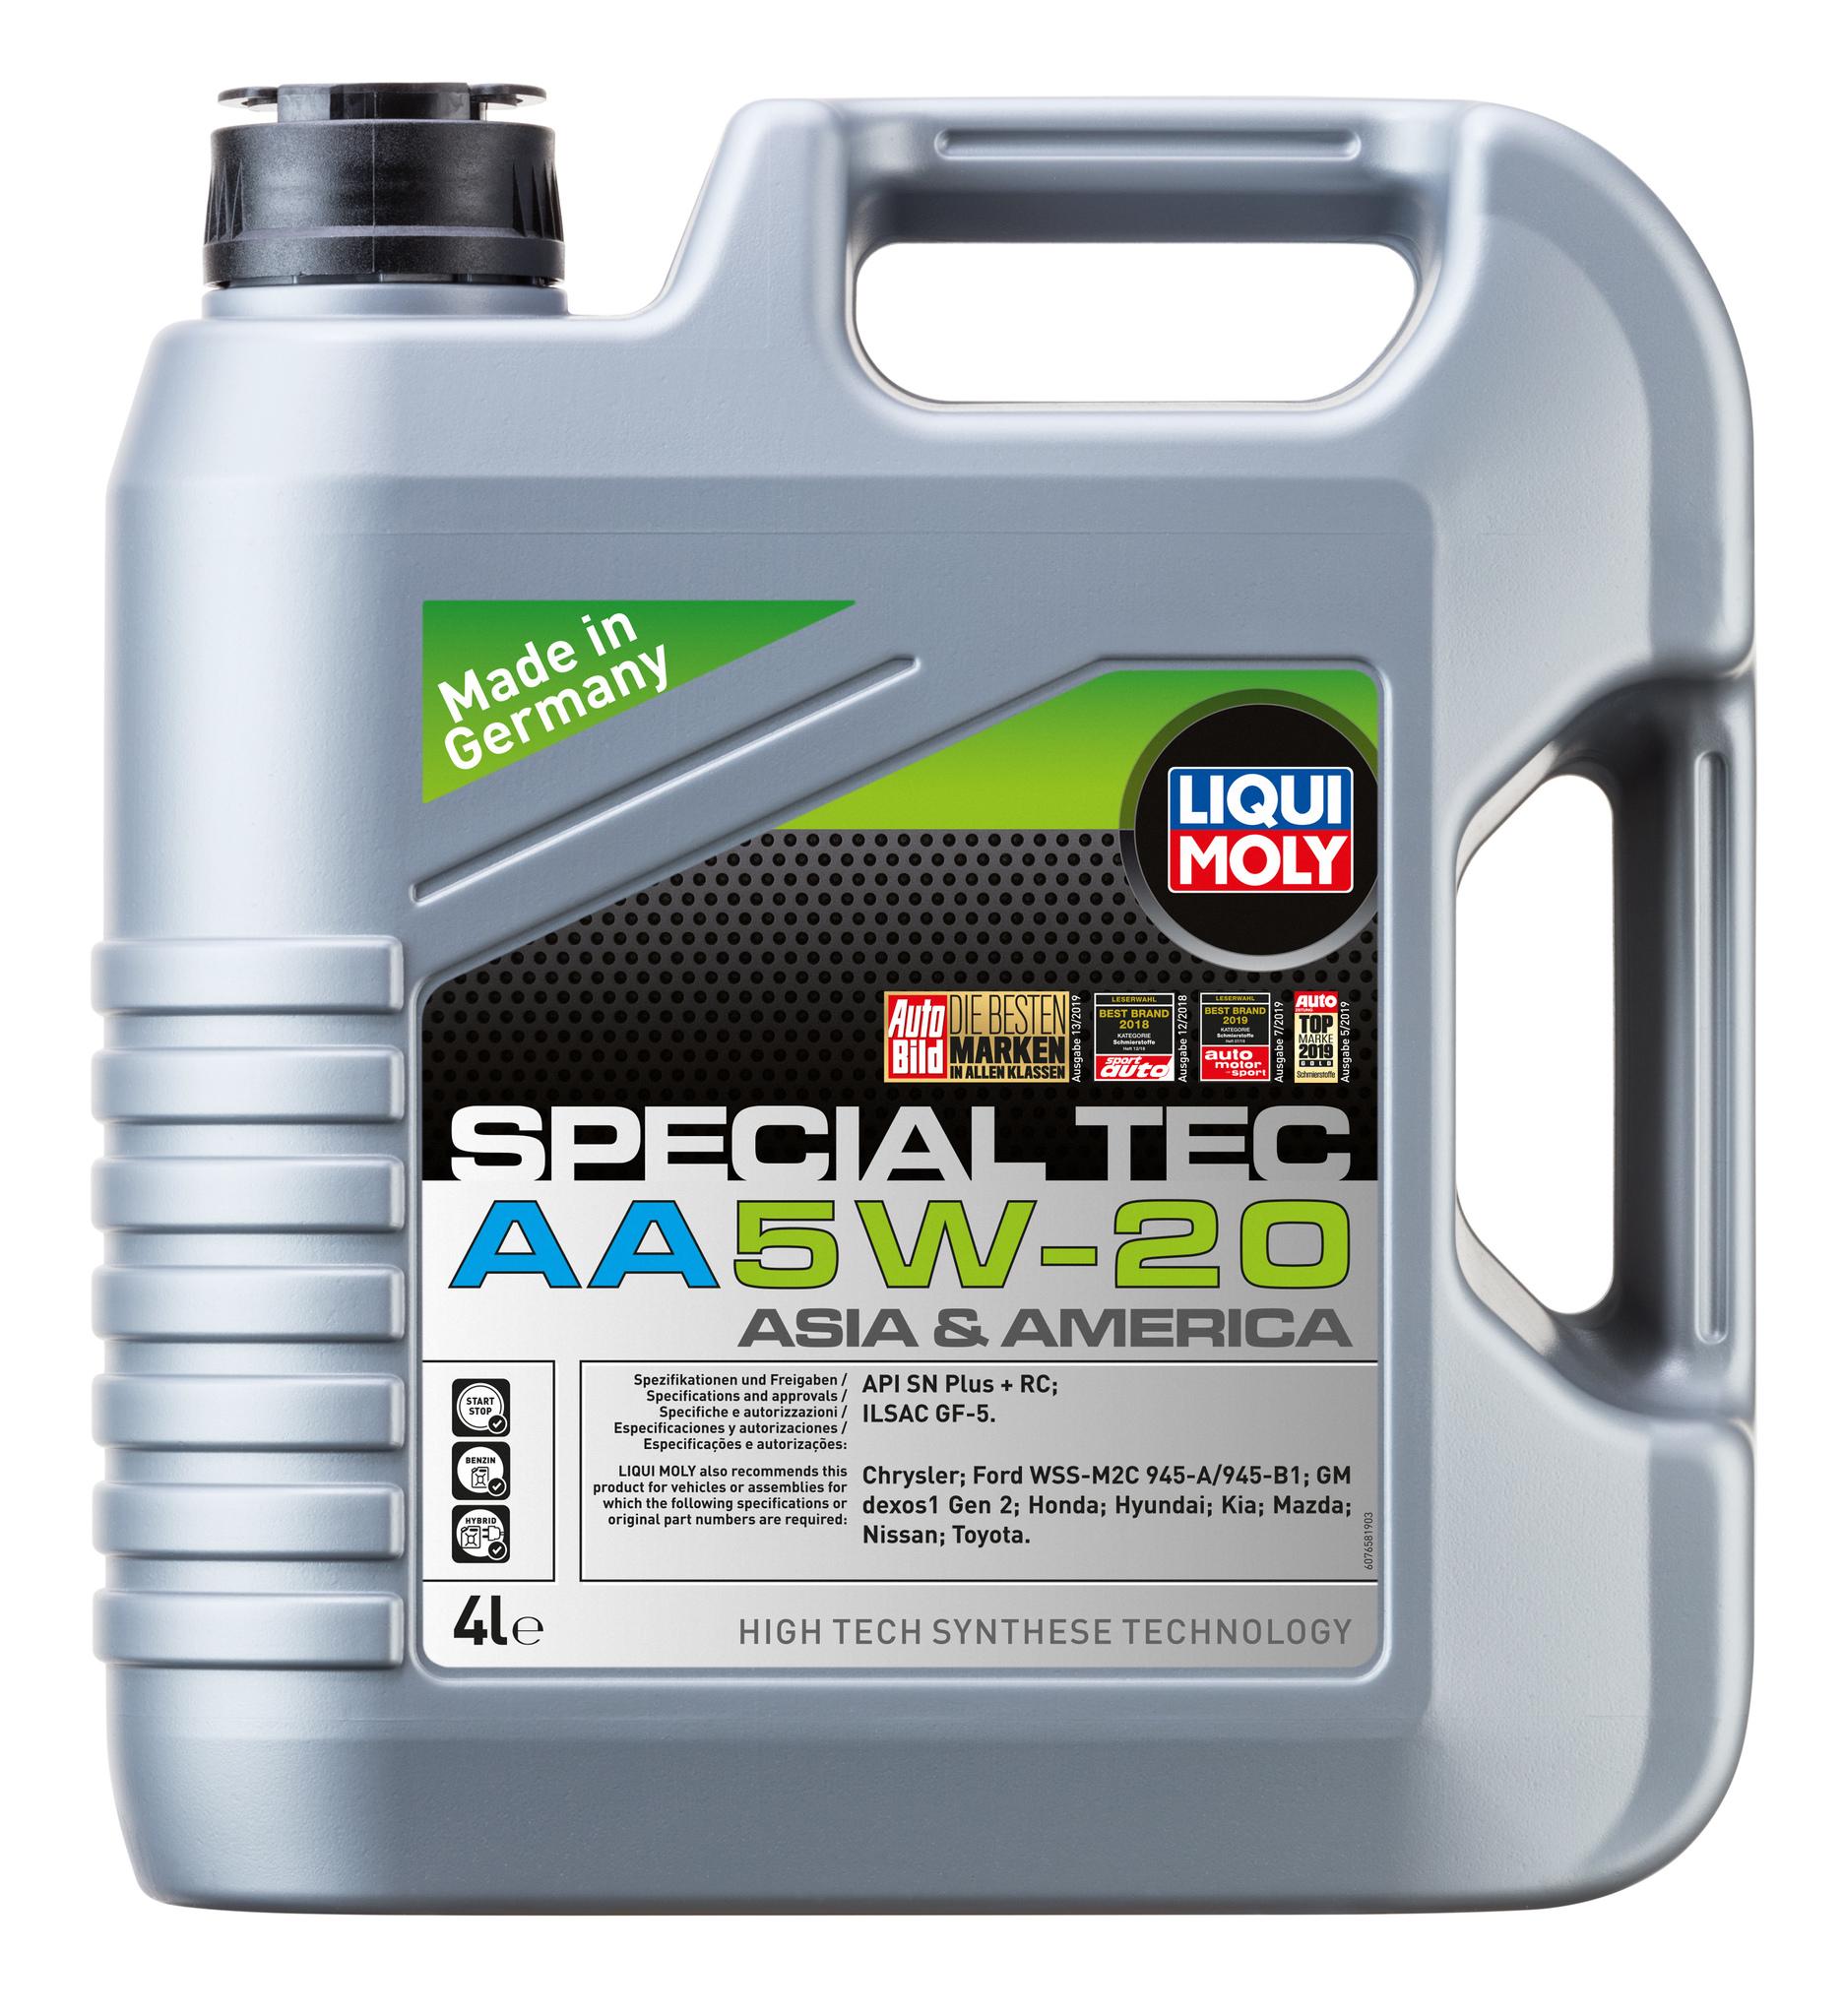 Liqui Moly Special Tec AA (Leichtlauf Special AA) 5W20  НС синтетическое моторное масло